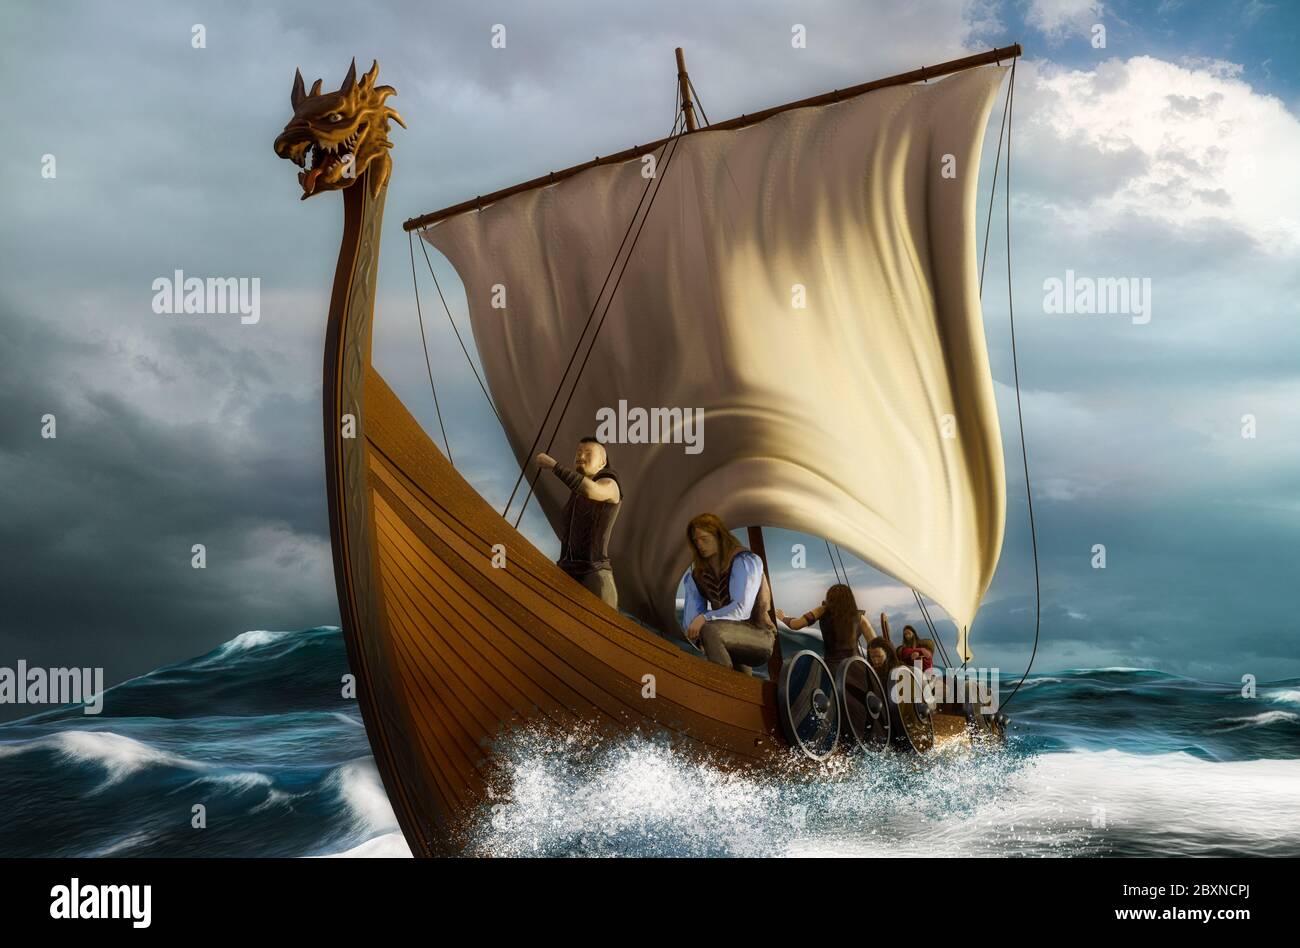 Viking ship on the open sea. Drakkar in the wavy ocean. 3D scene with digital painting. Stock Photo